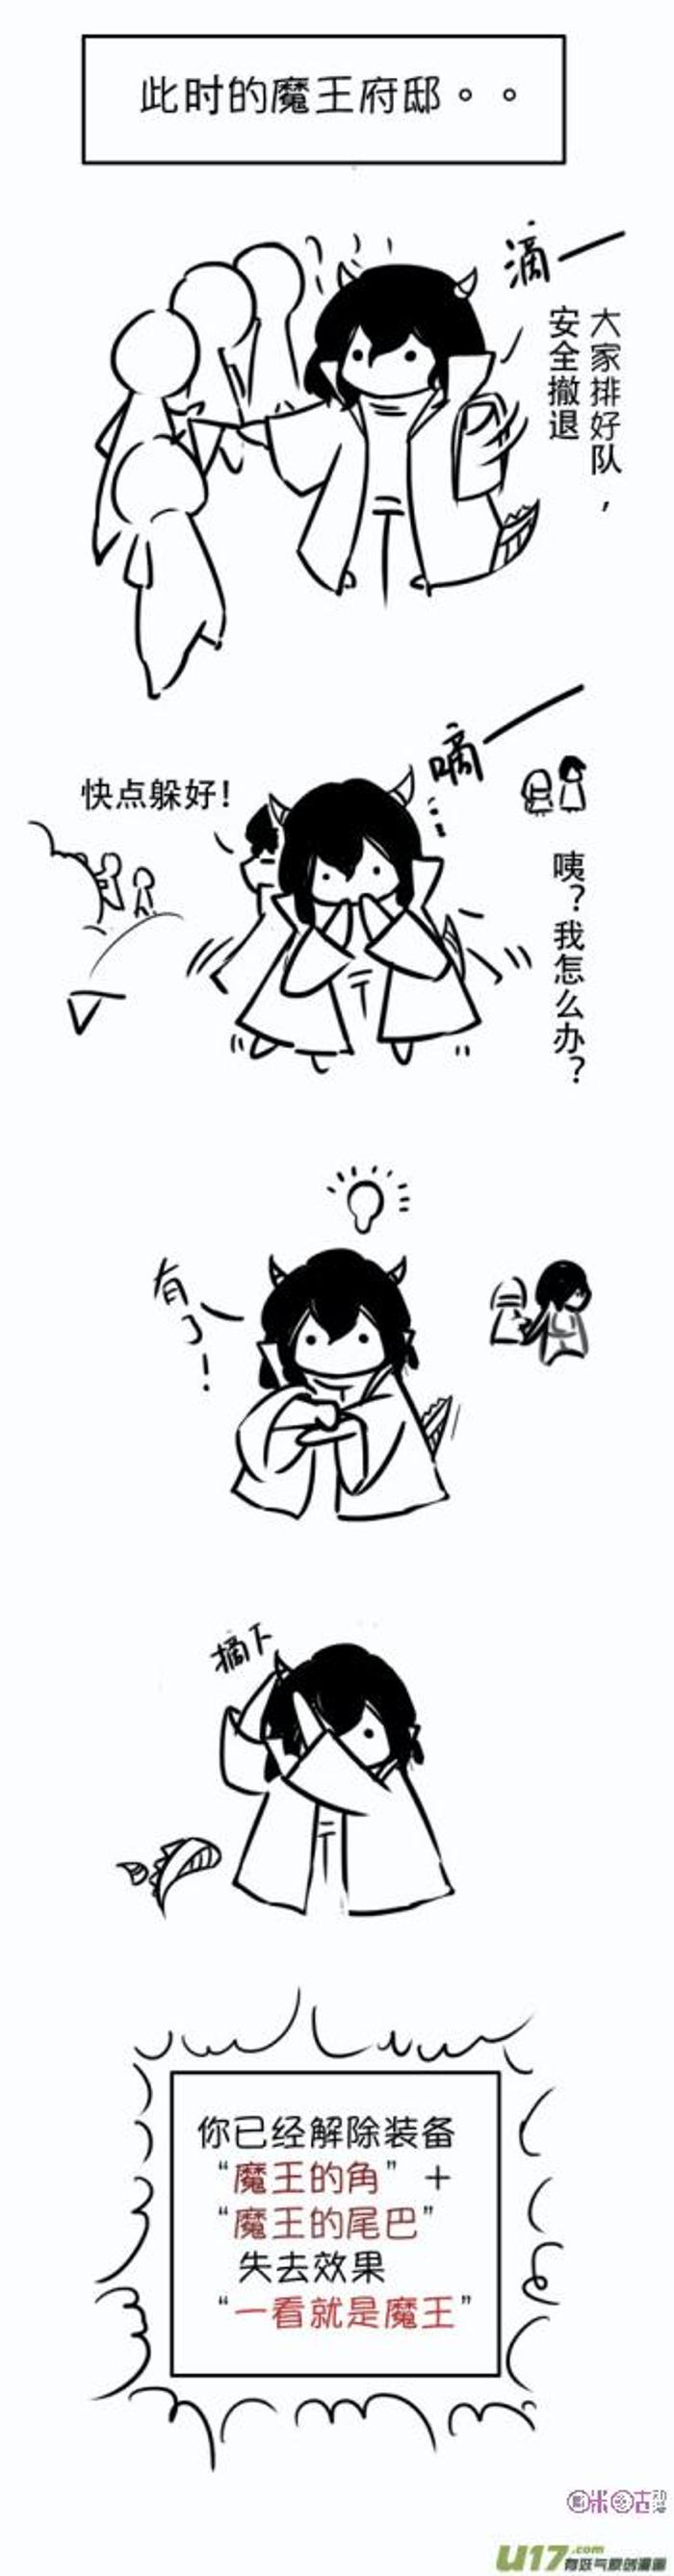 袭击(1)